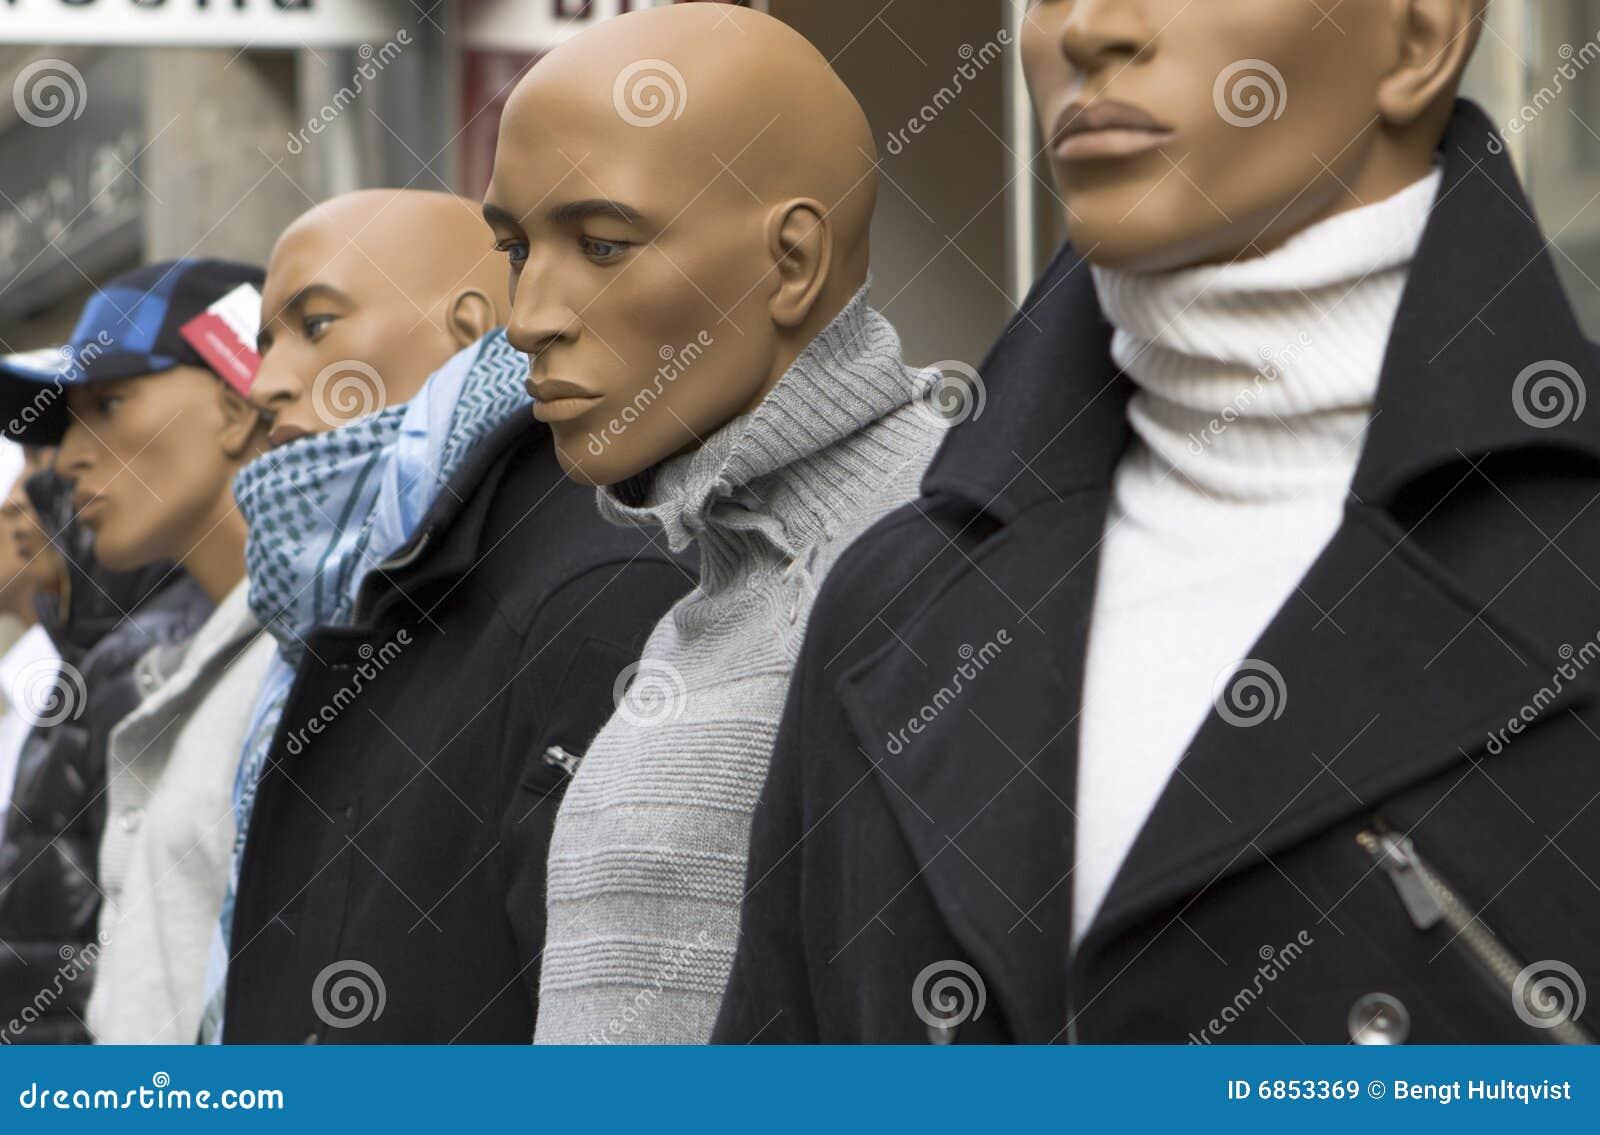 Maniquí masculino en la calle